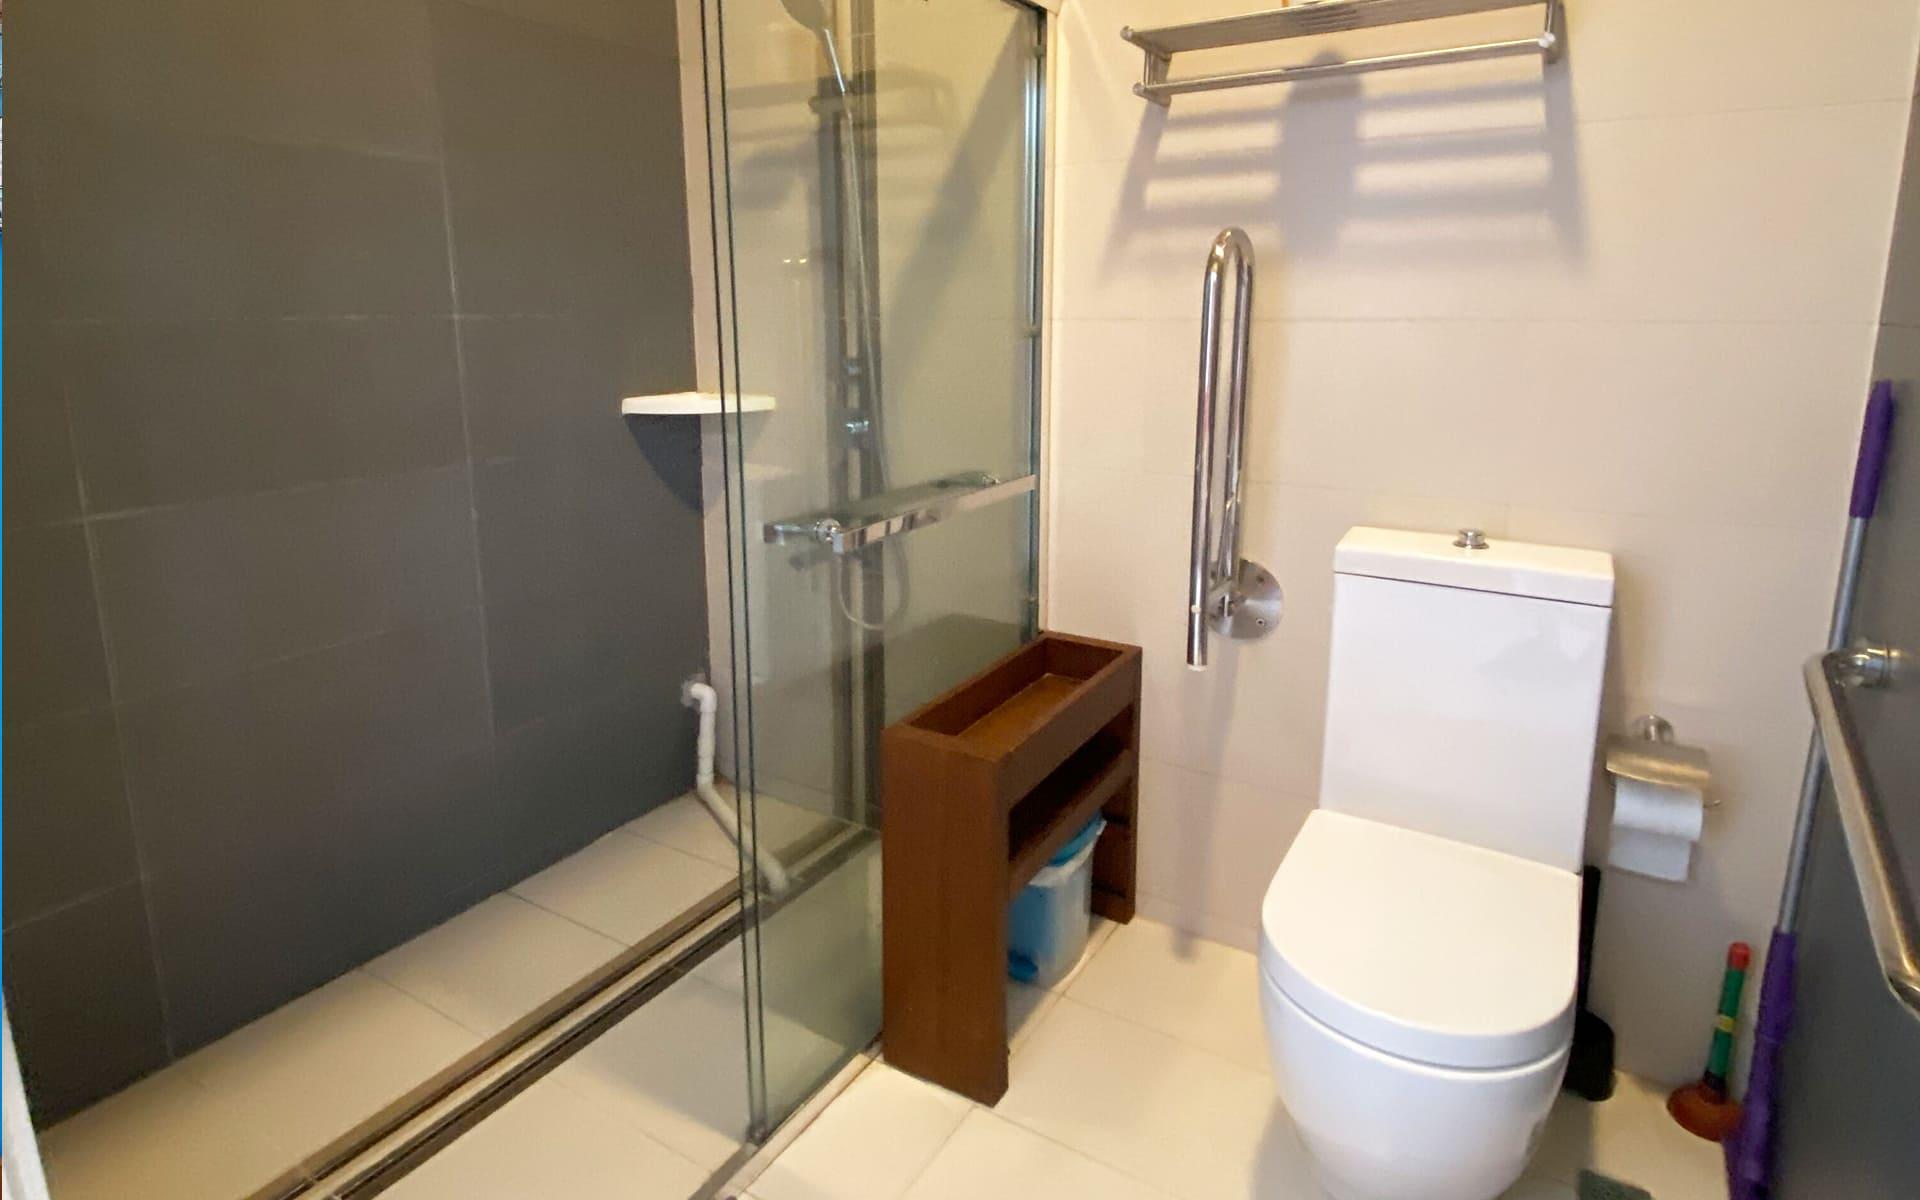 hk_service_apartment_5250793091589446597.jpg